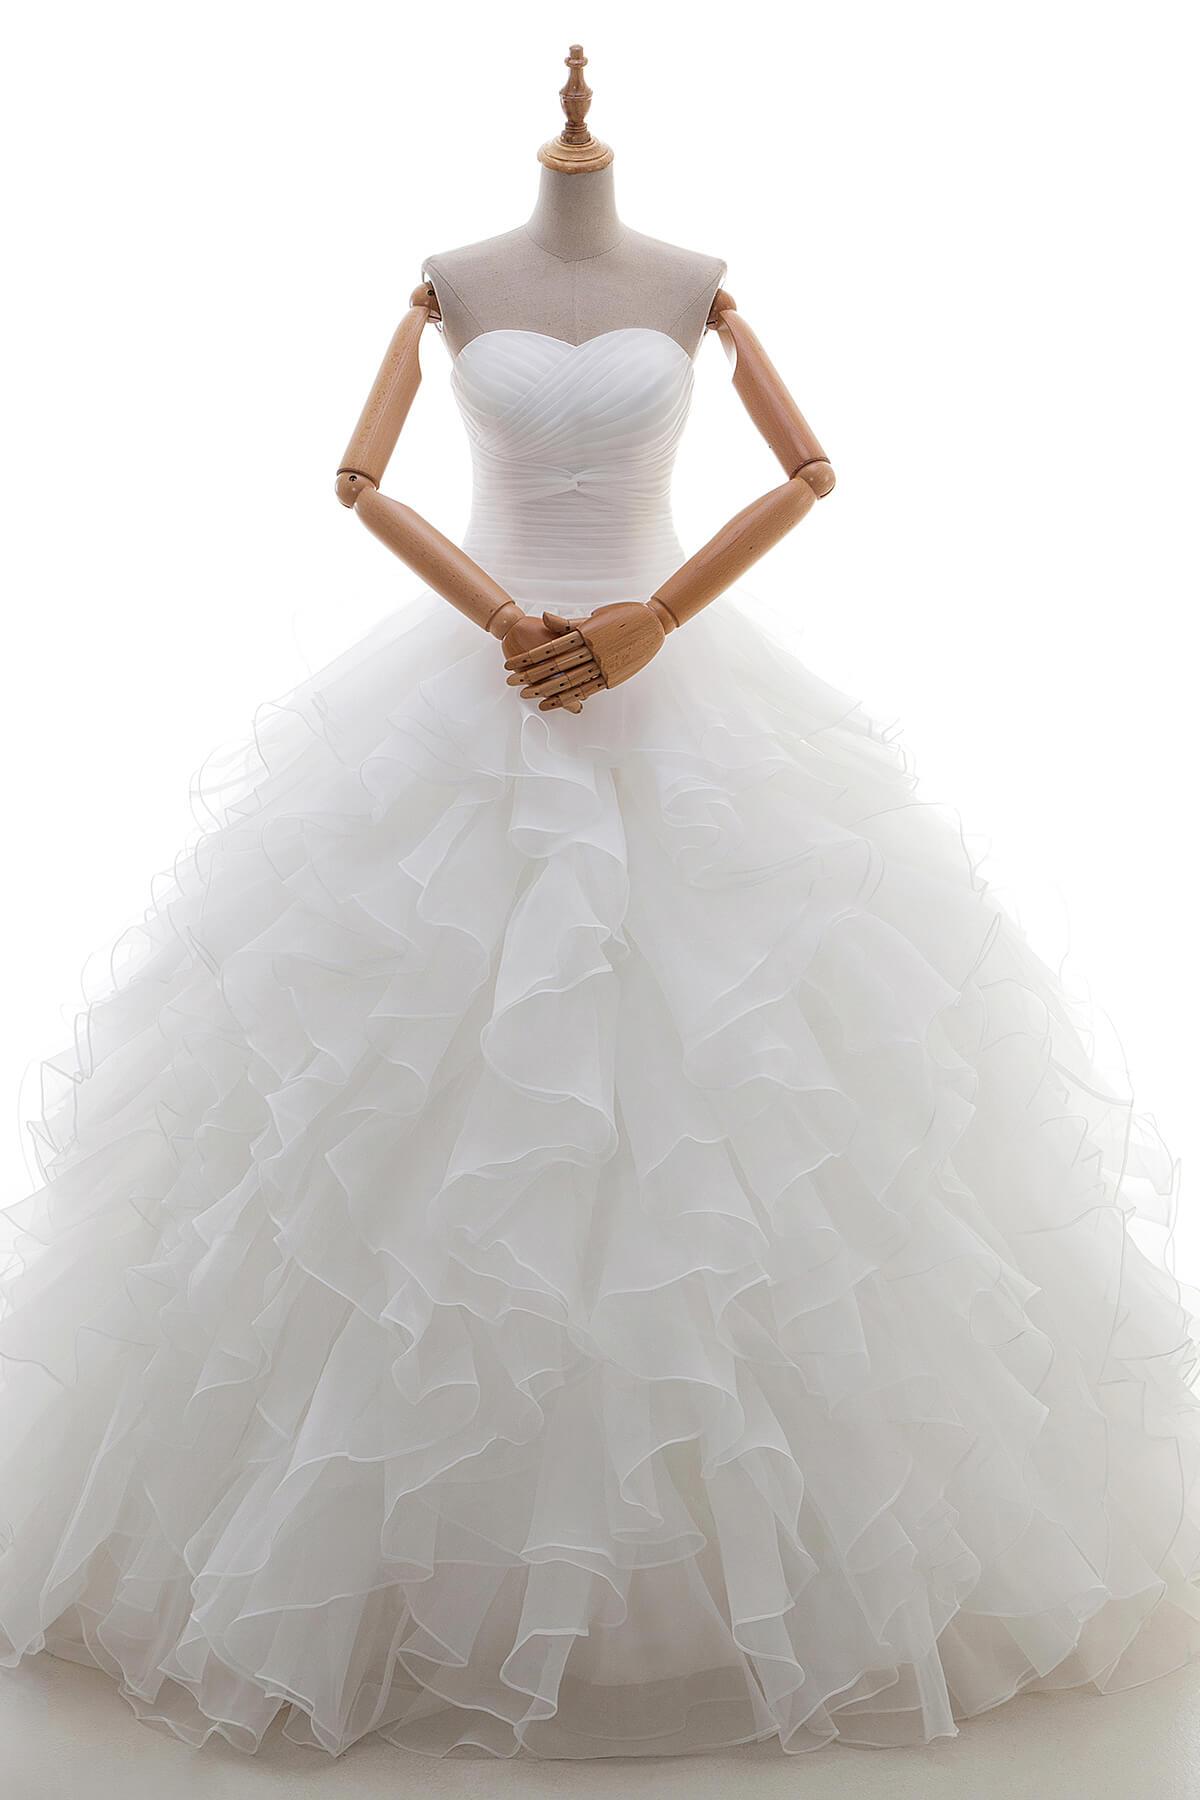 Cocomelody Black Wedding Dress List - B14TB0052